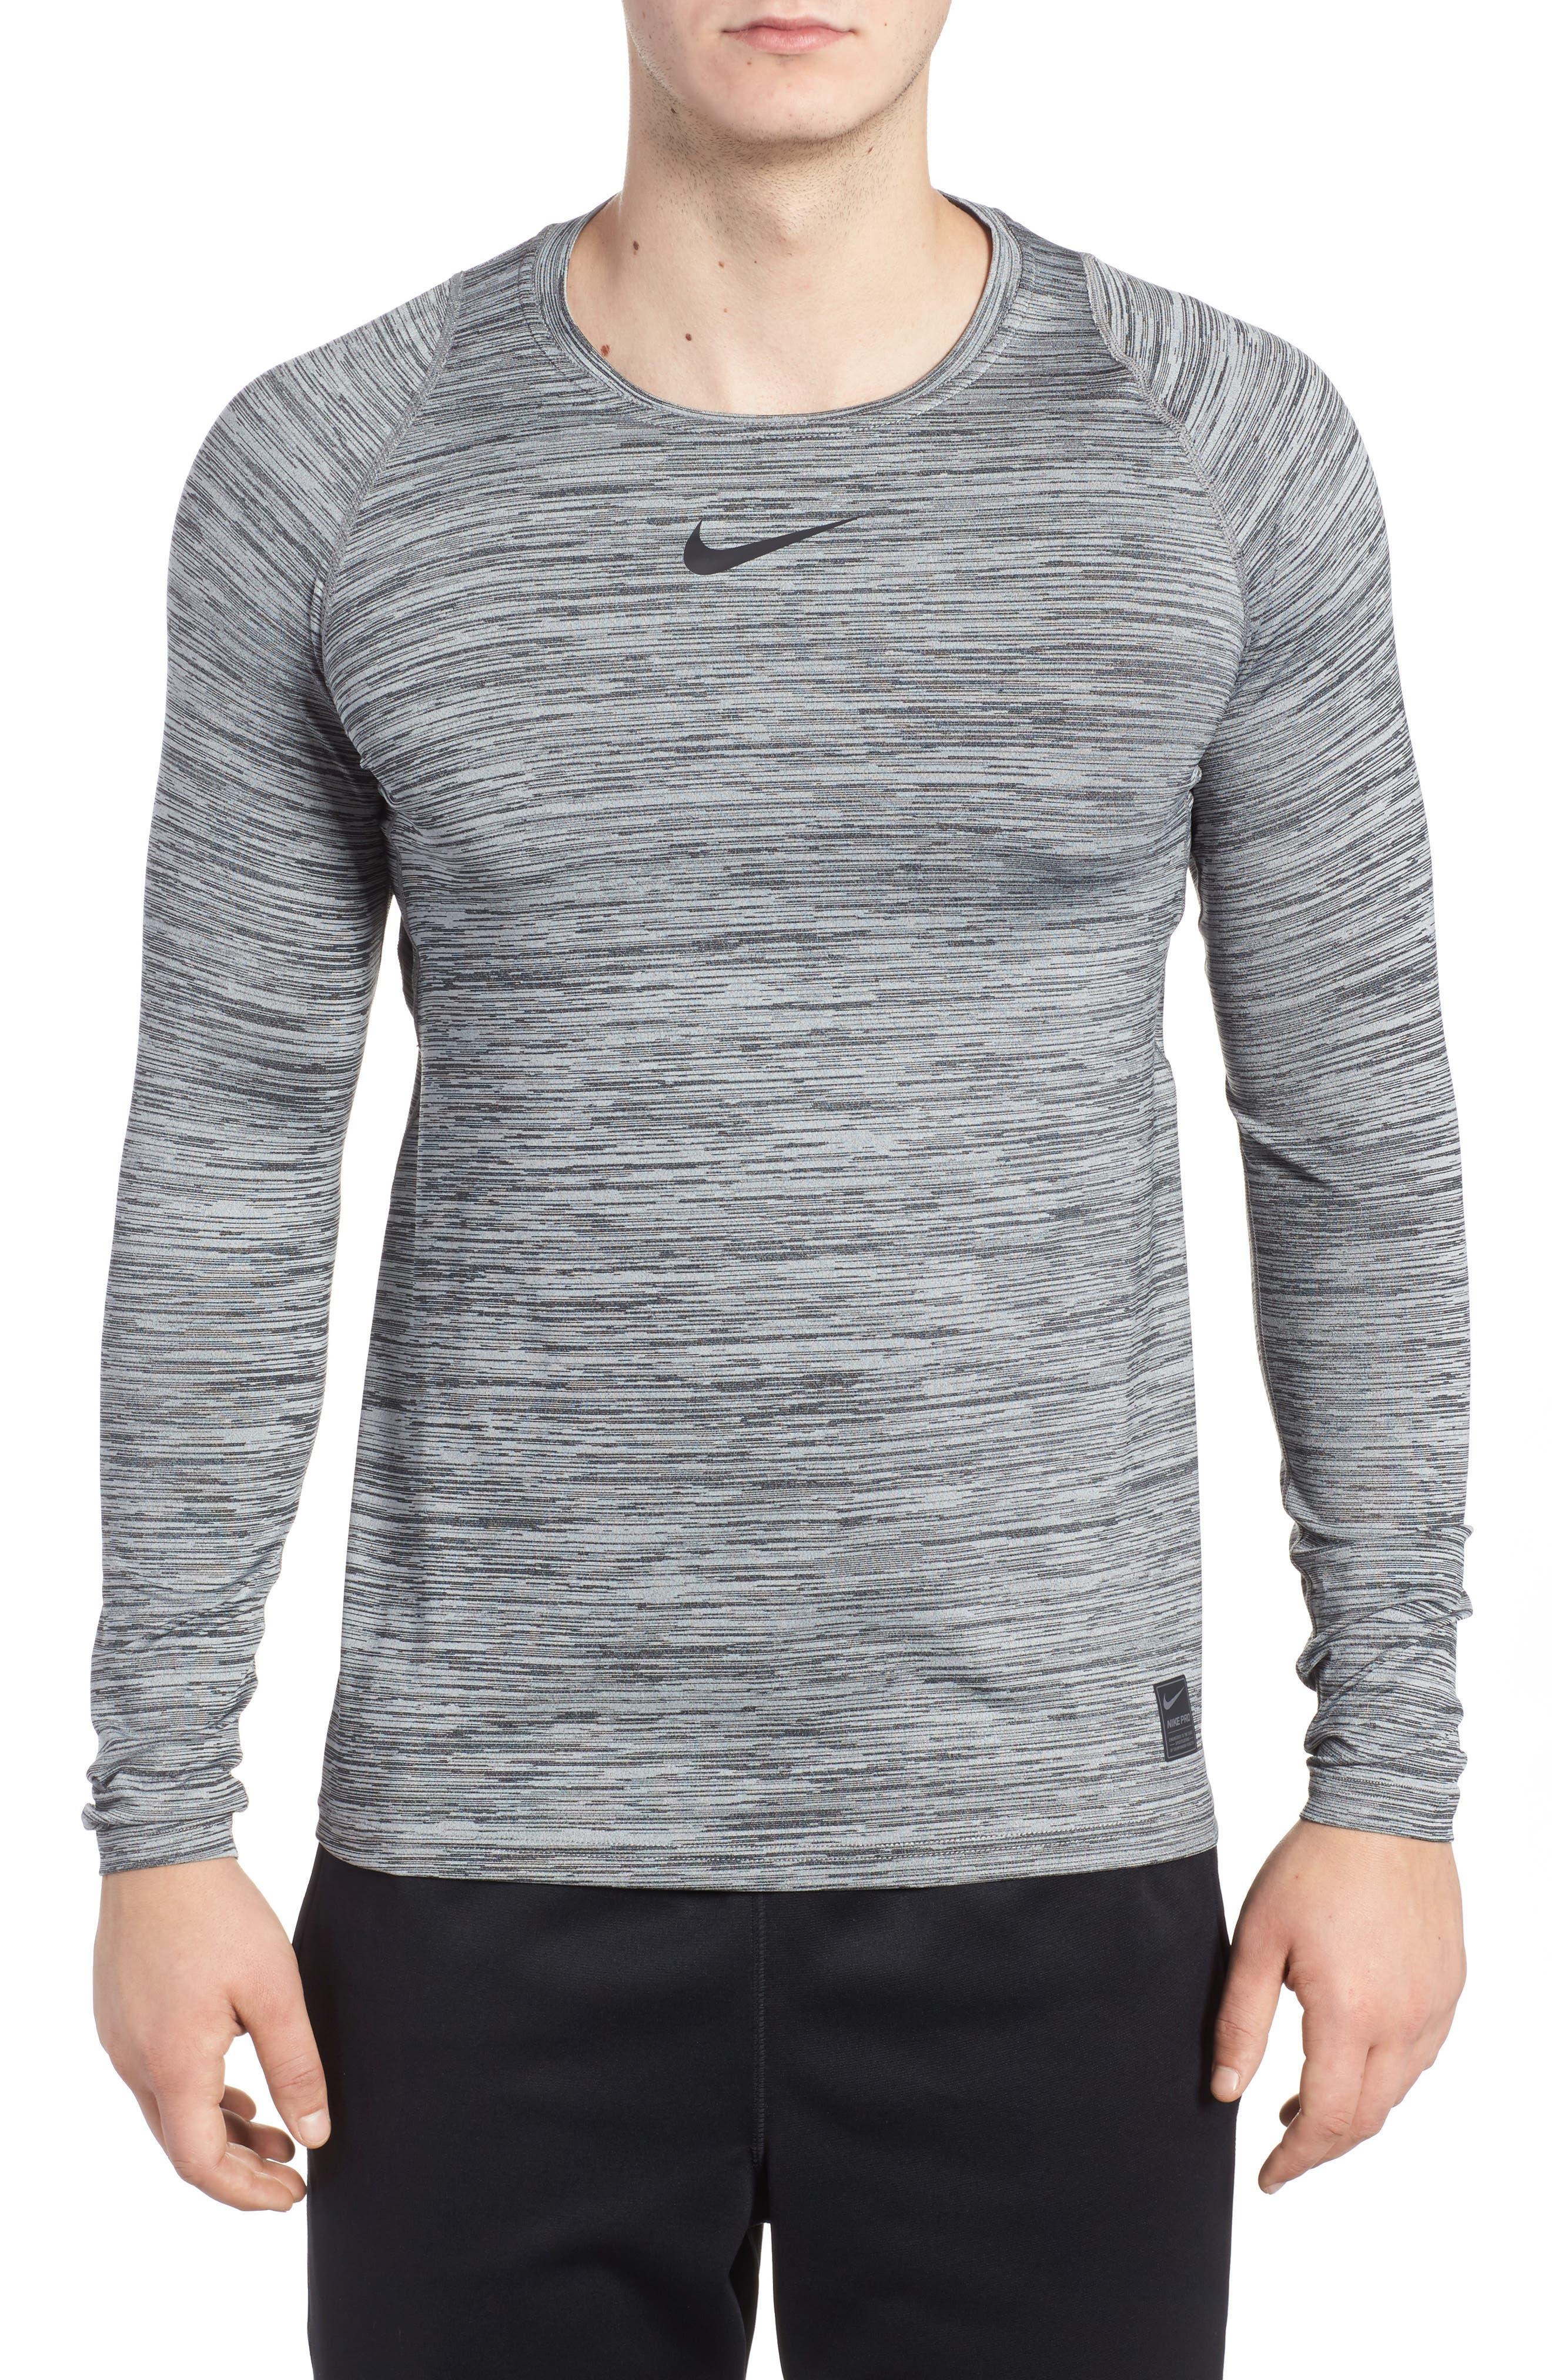 Pro Long Sleeve T-Shirt,                         Main,                         color, 010